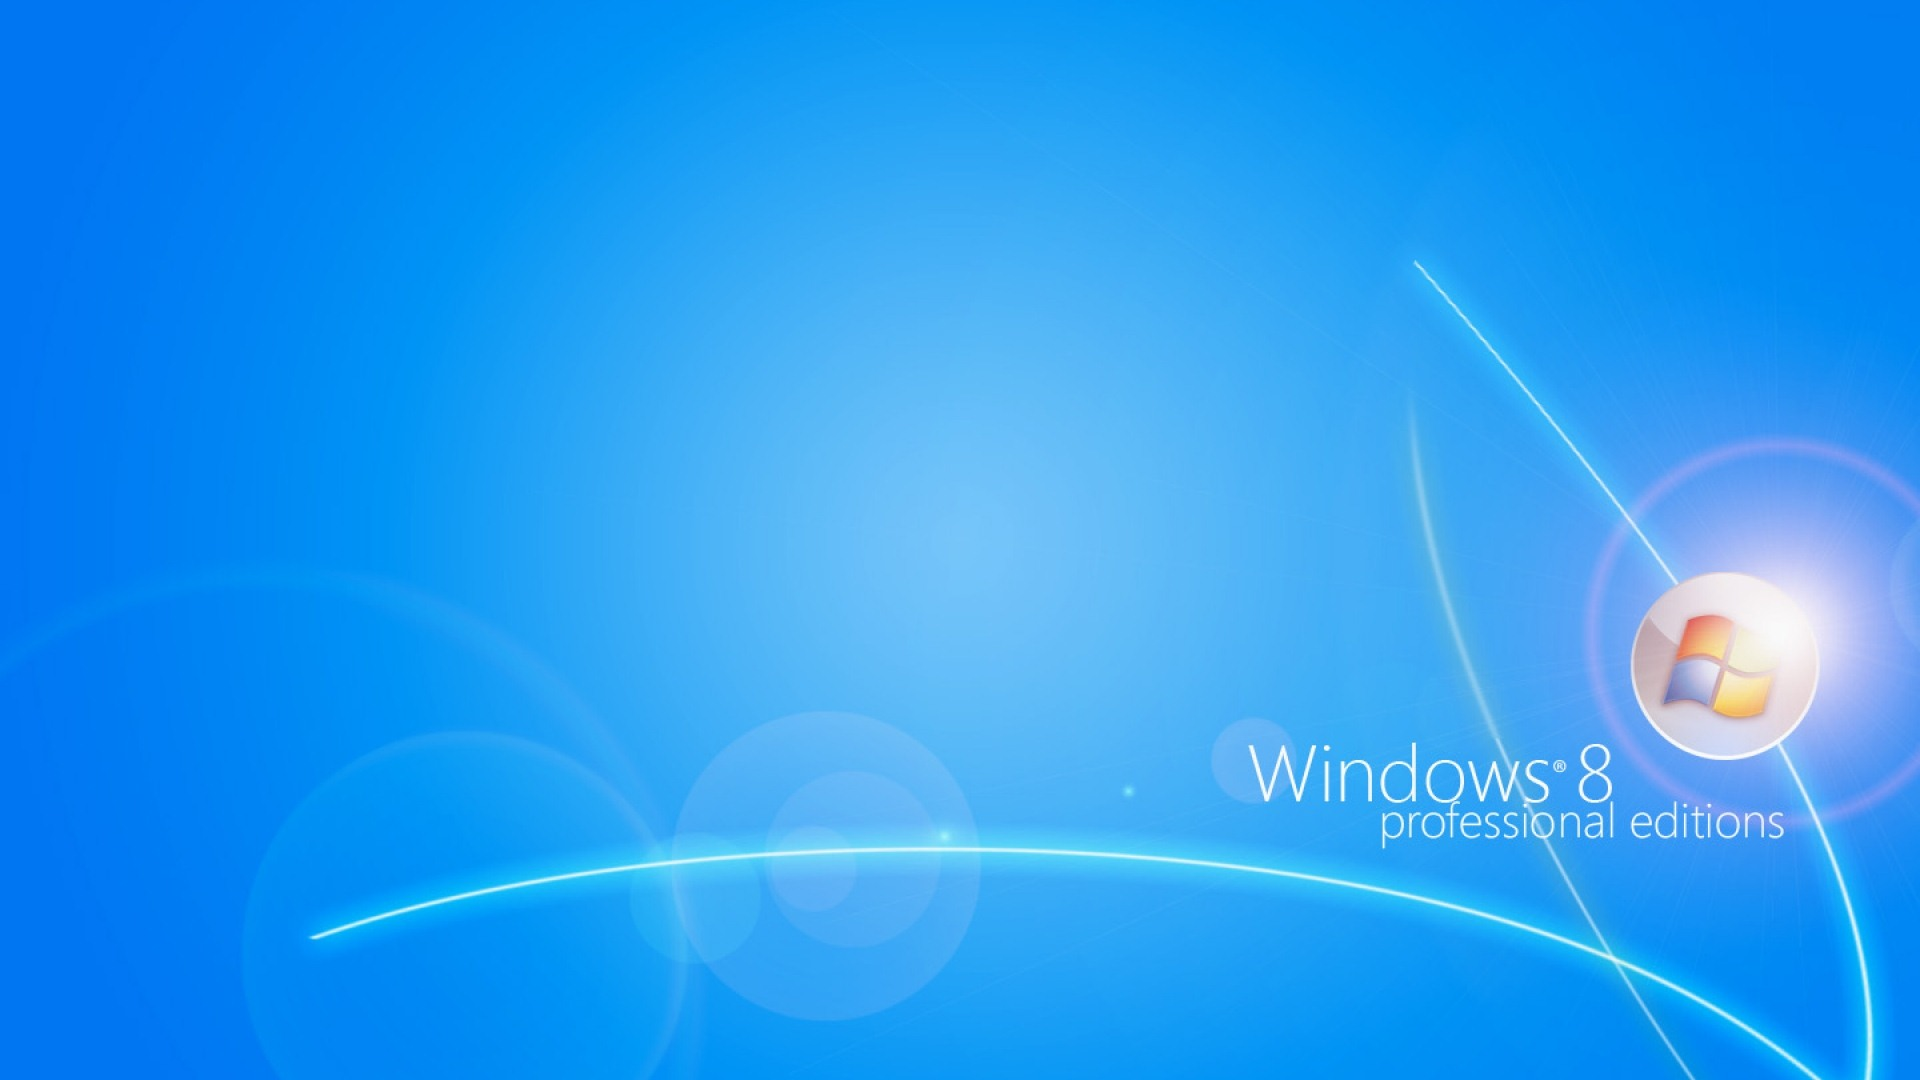 microsoft windows 7 kennenlernen Königswinter